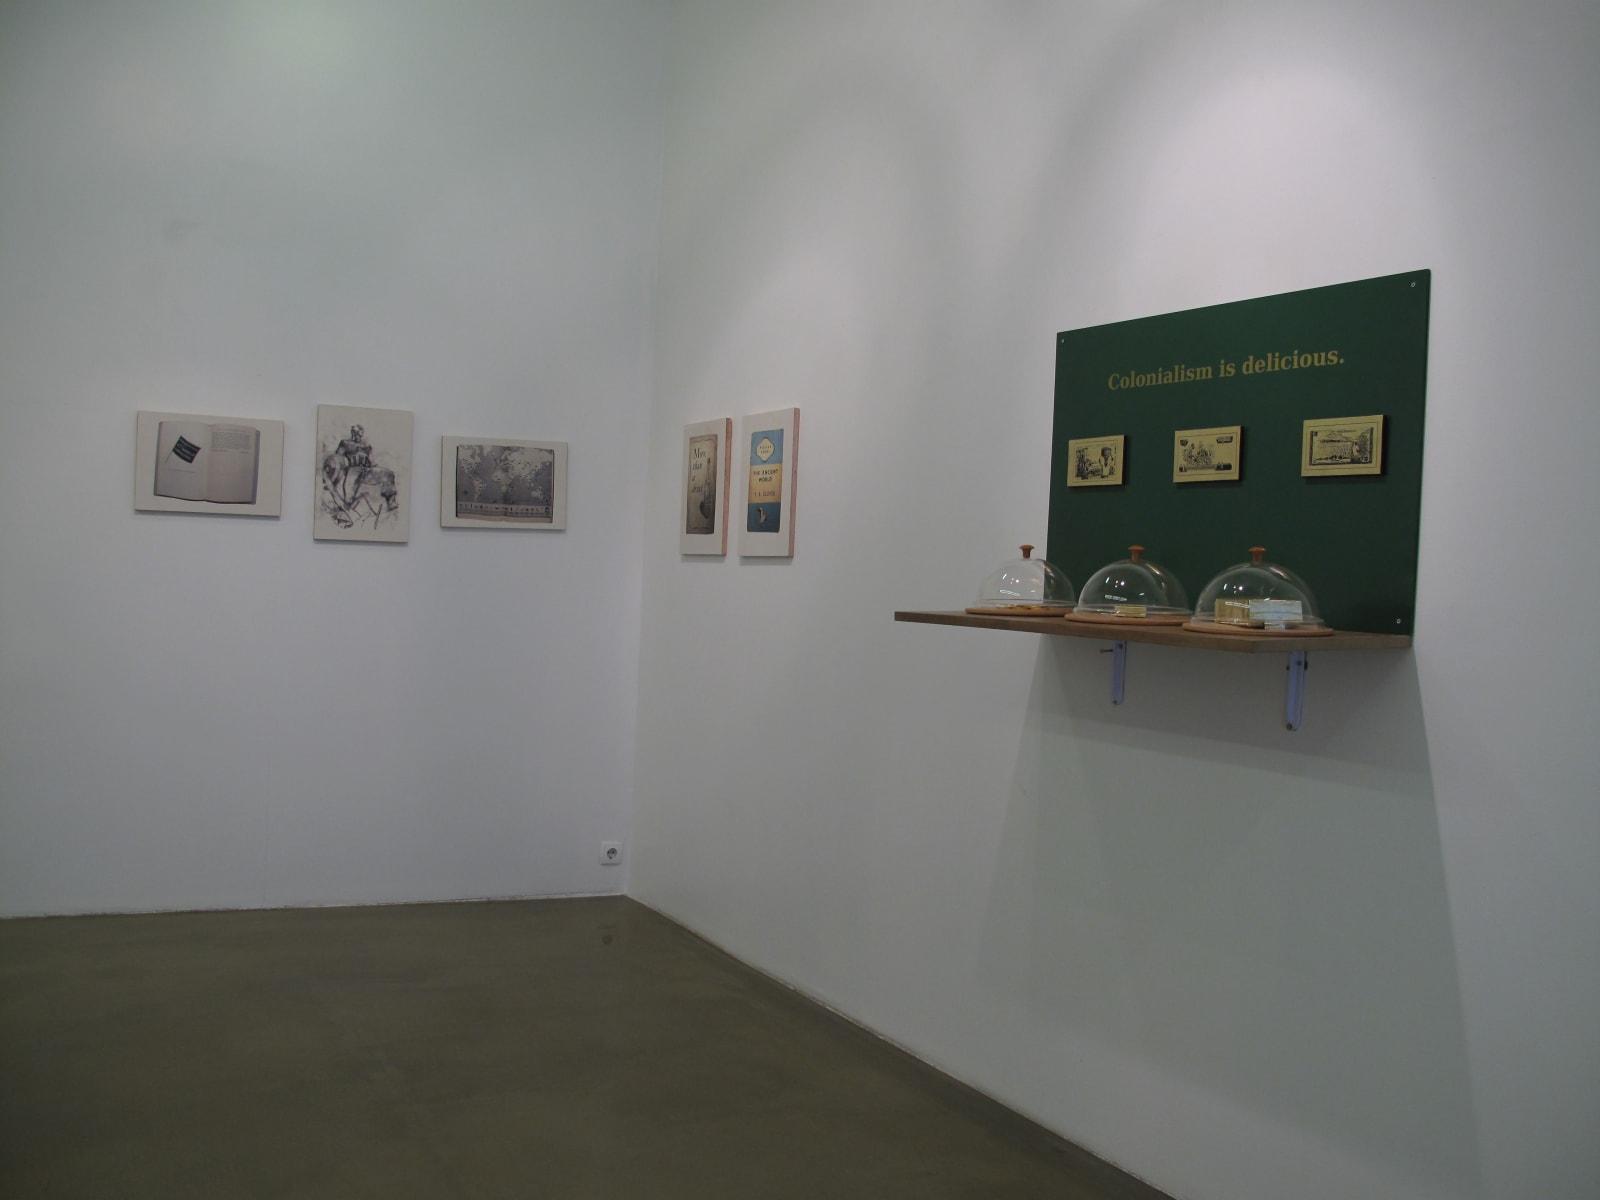 Azadeh Akhlaghi, Volkan Aslan, Nancy Atakan, Sam Curtis, Mehmet Dere, Carol Sabbadini, Anna Heidenhain, Borga Kantürk